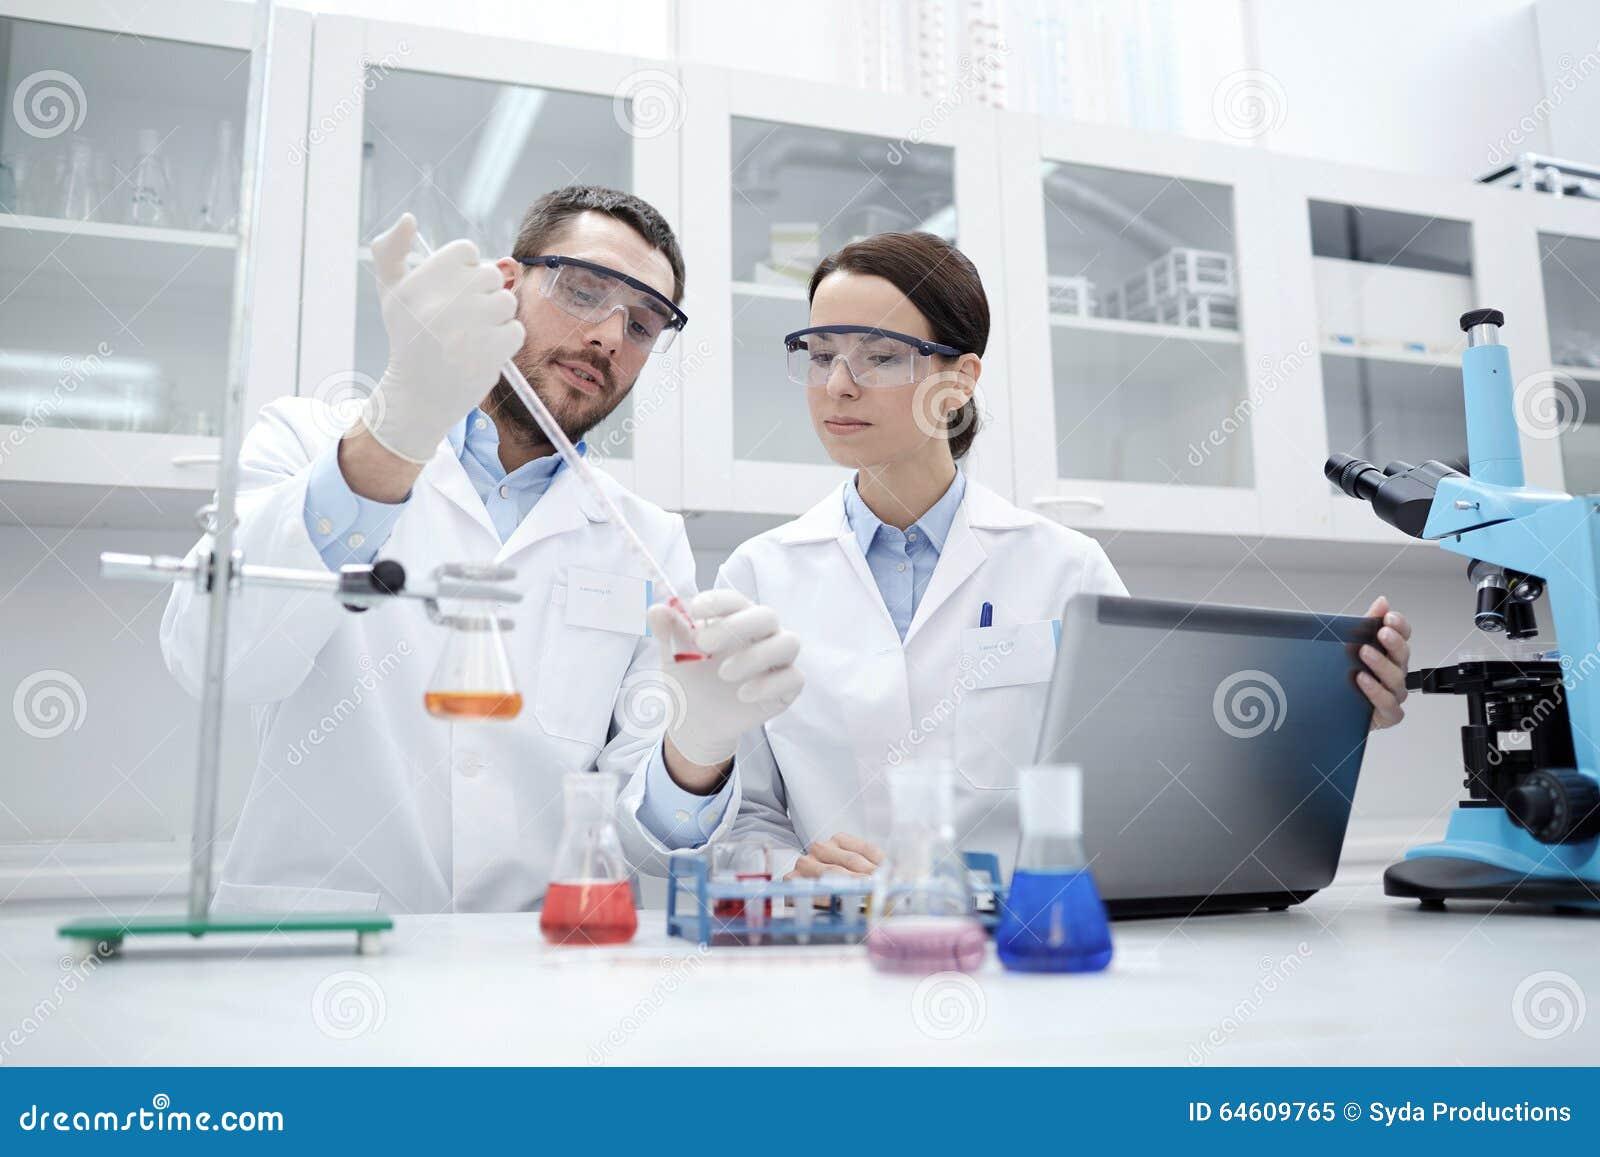 2 doctors team up on blonde milf 3